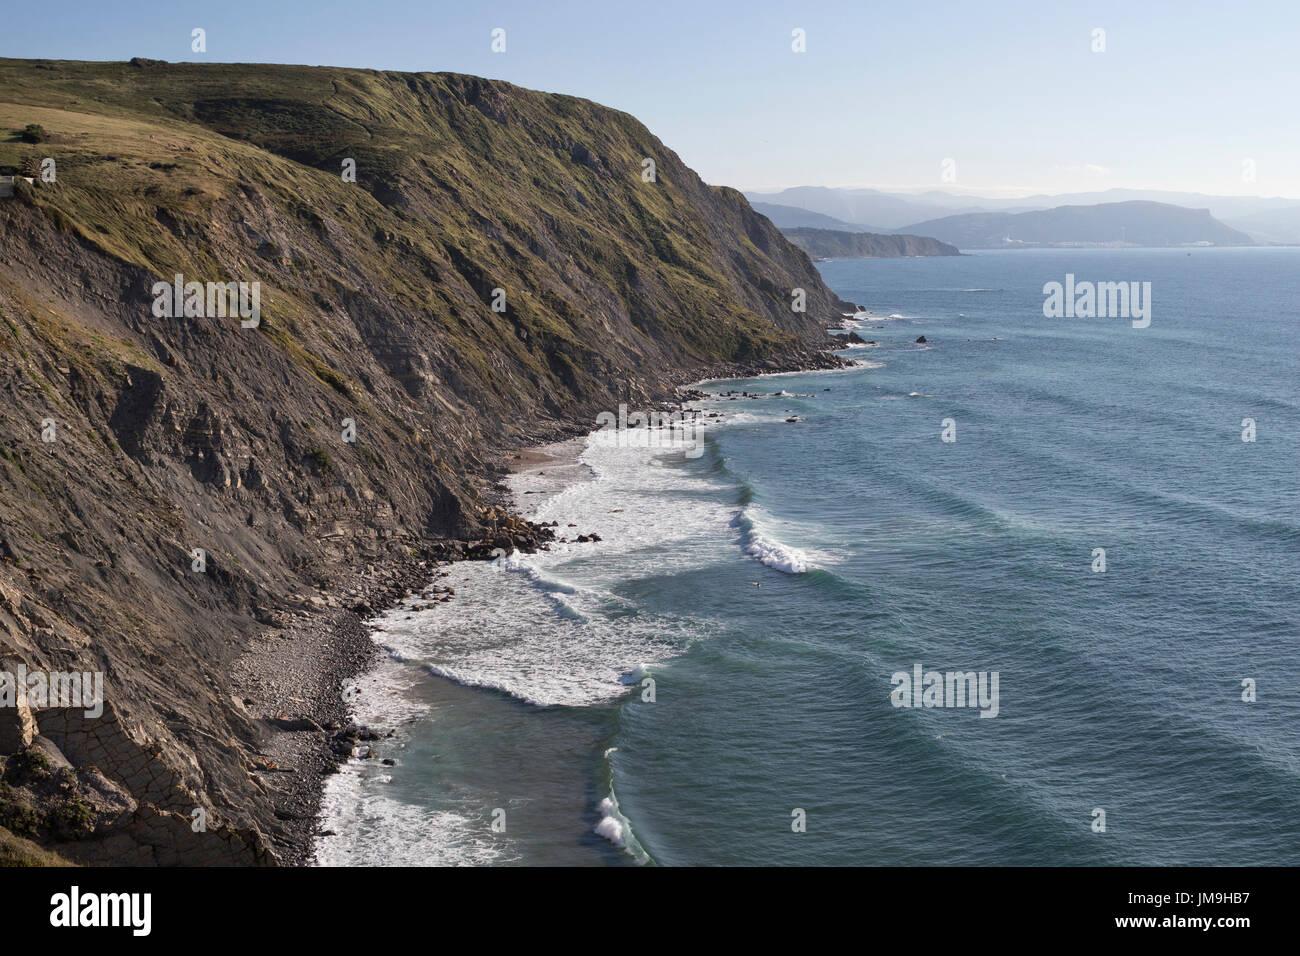 Cliff with stone beach in Barrika (Bizkaia, Euskadi, Spain). - Stock Image